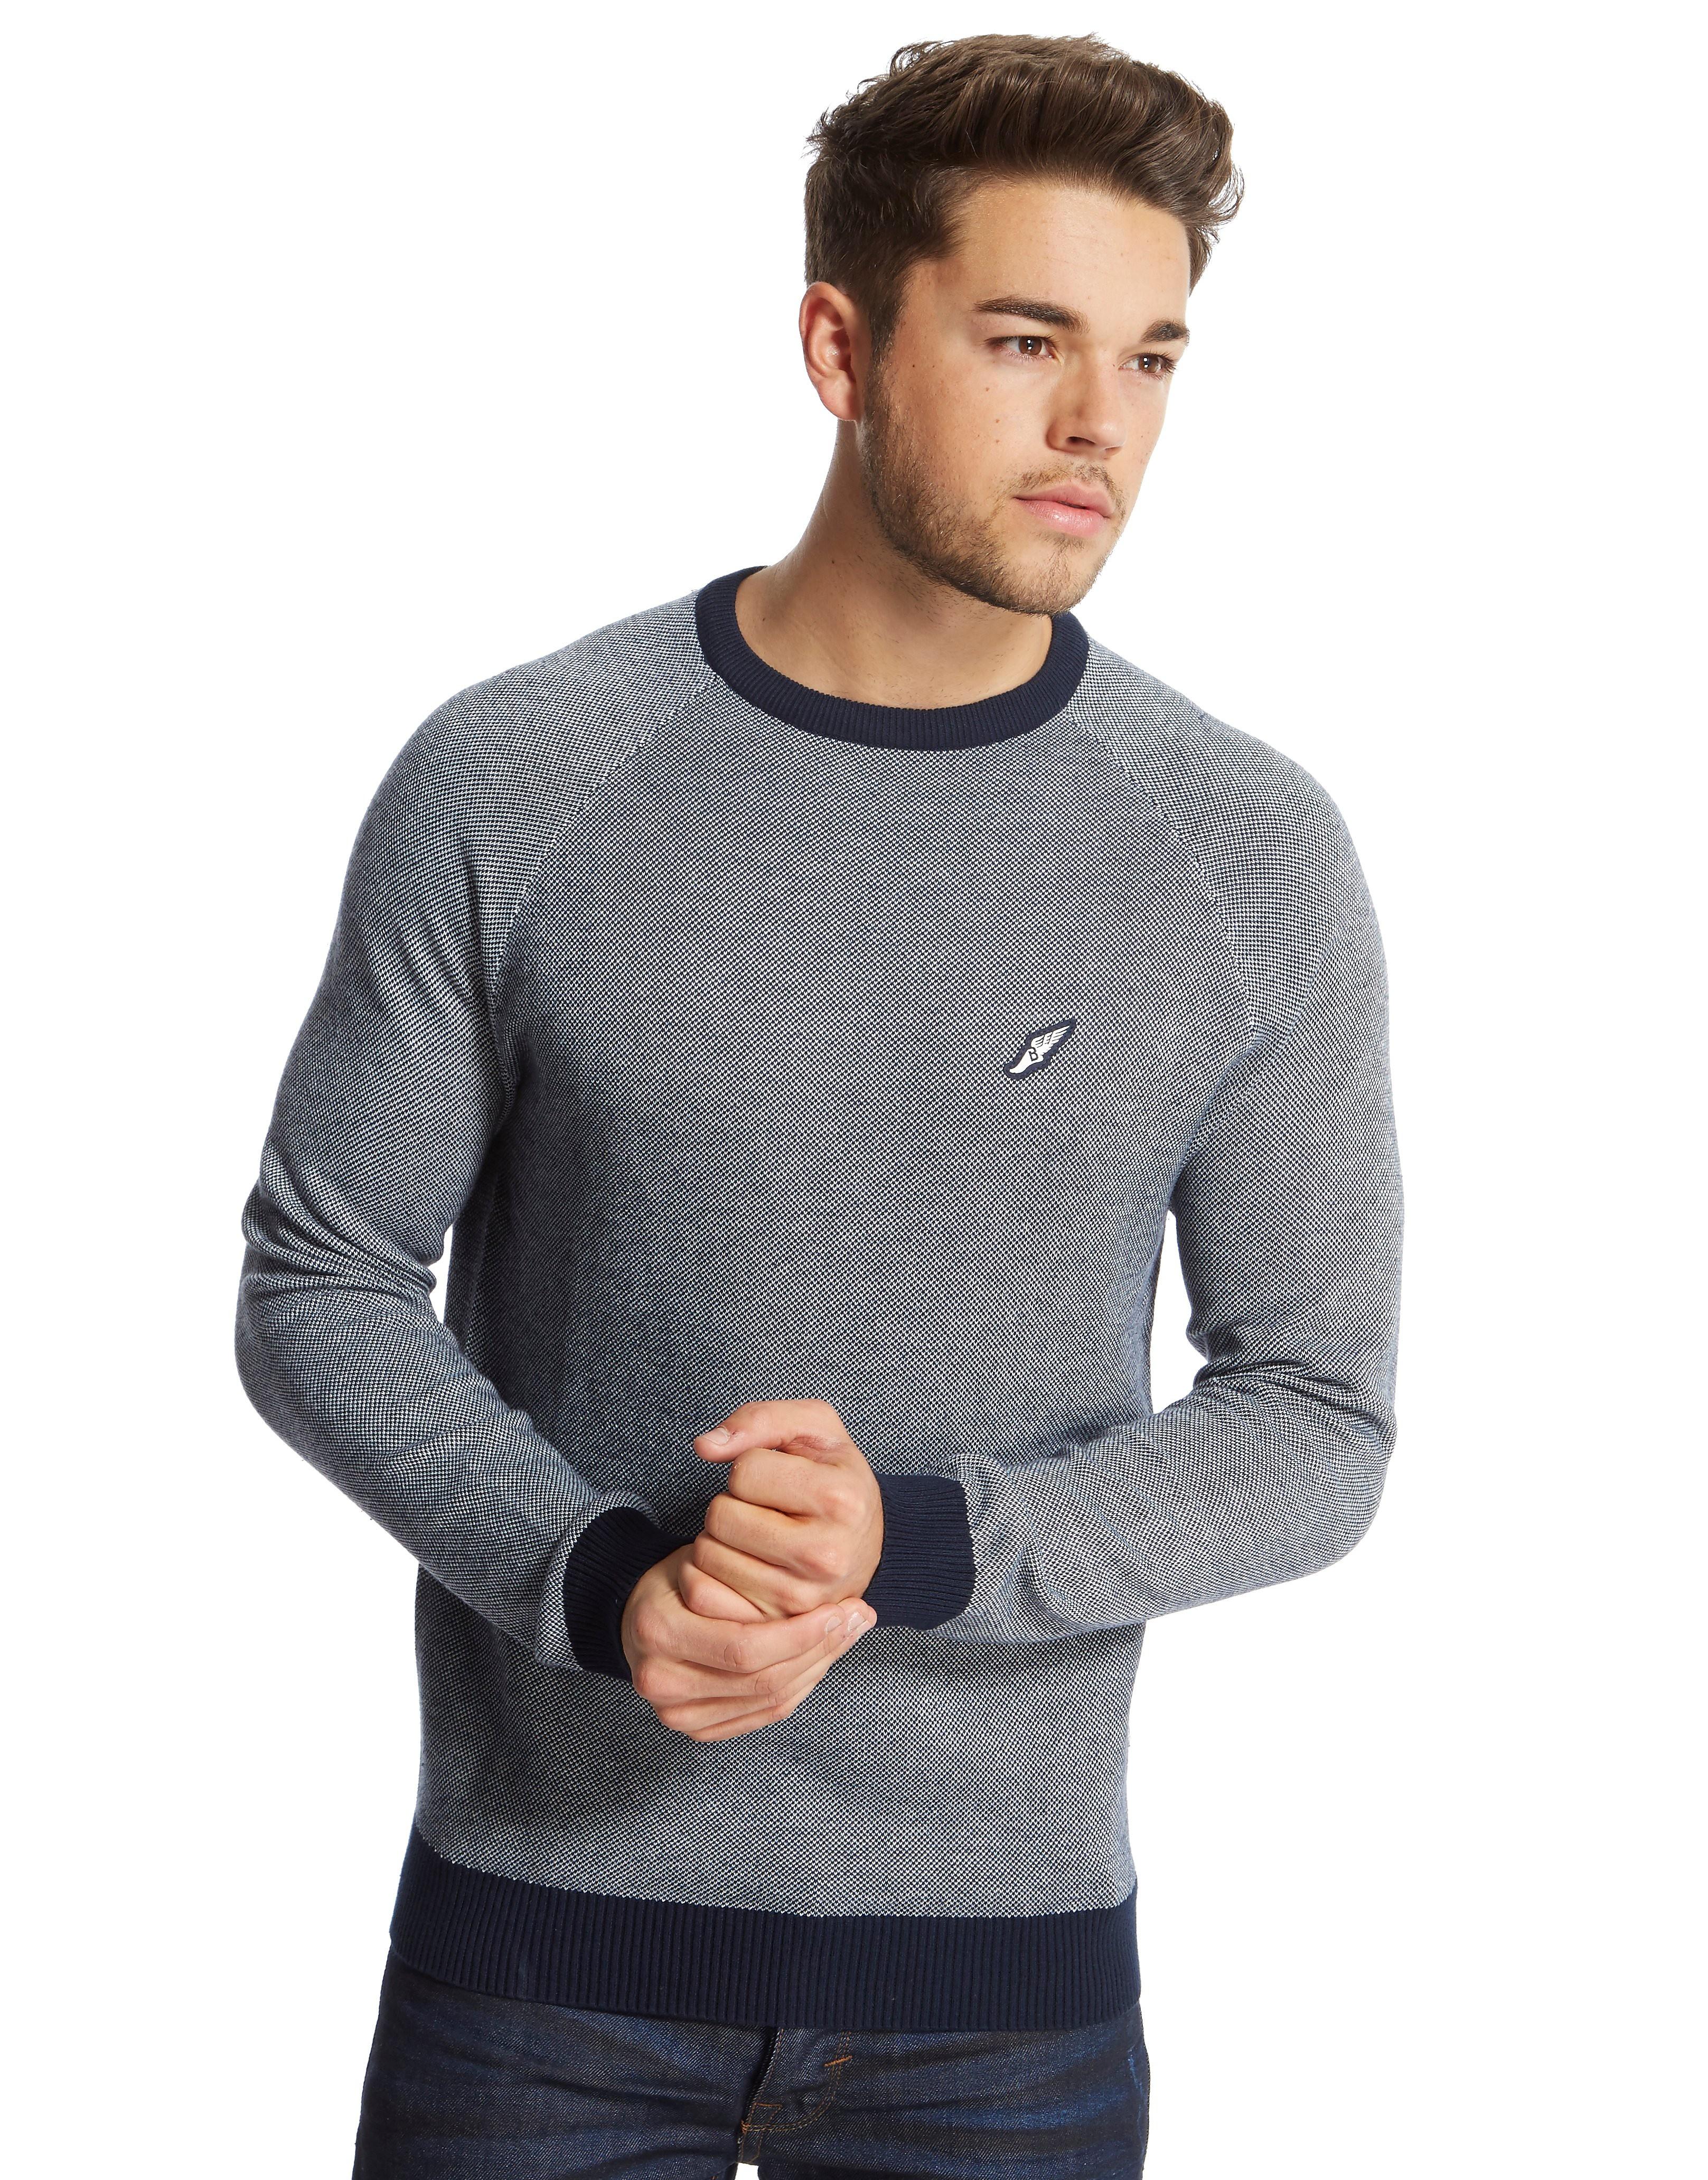 Brookhaven Captain Knit Crew Sweatshirt